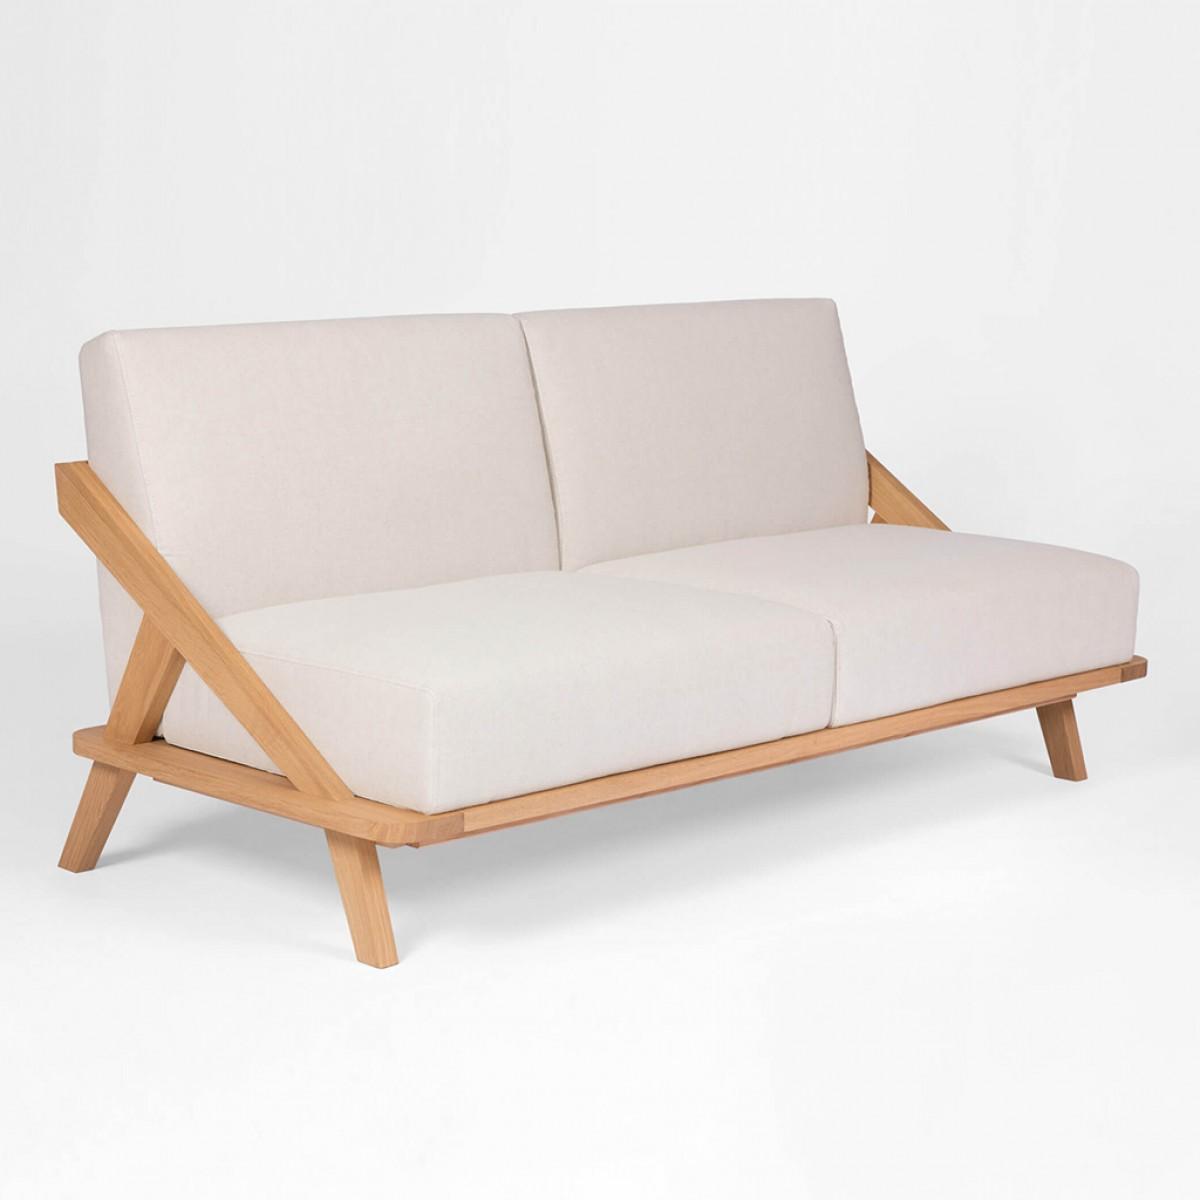 ellenberger Nordic Space Sofa